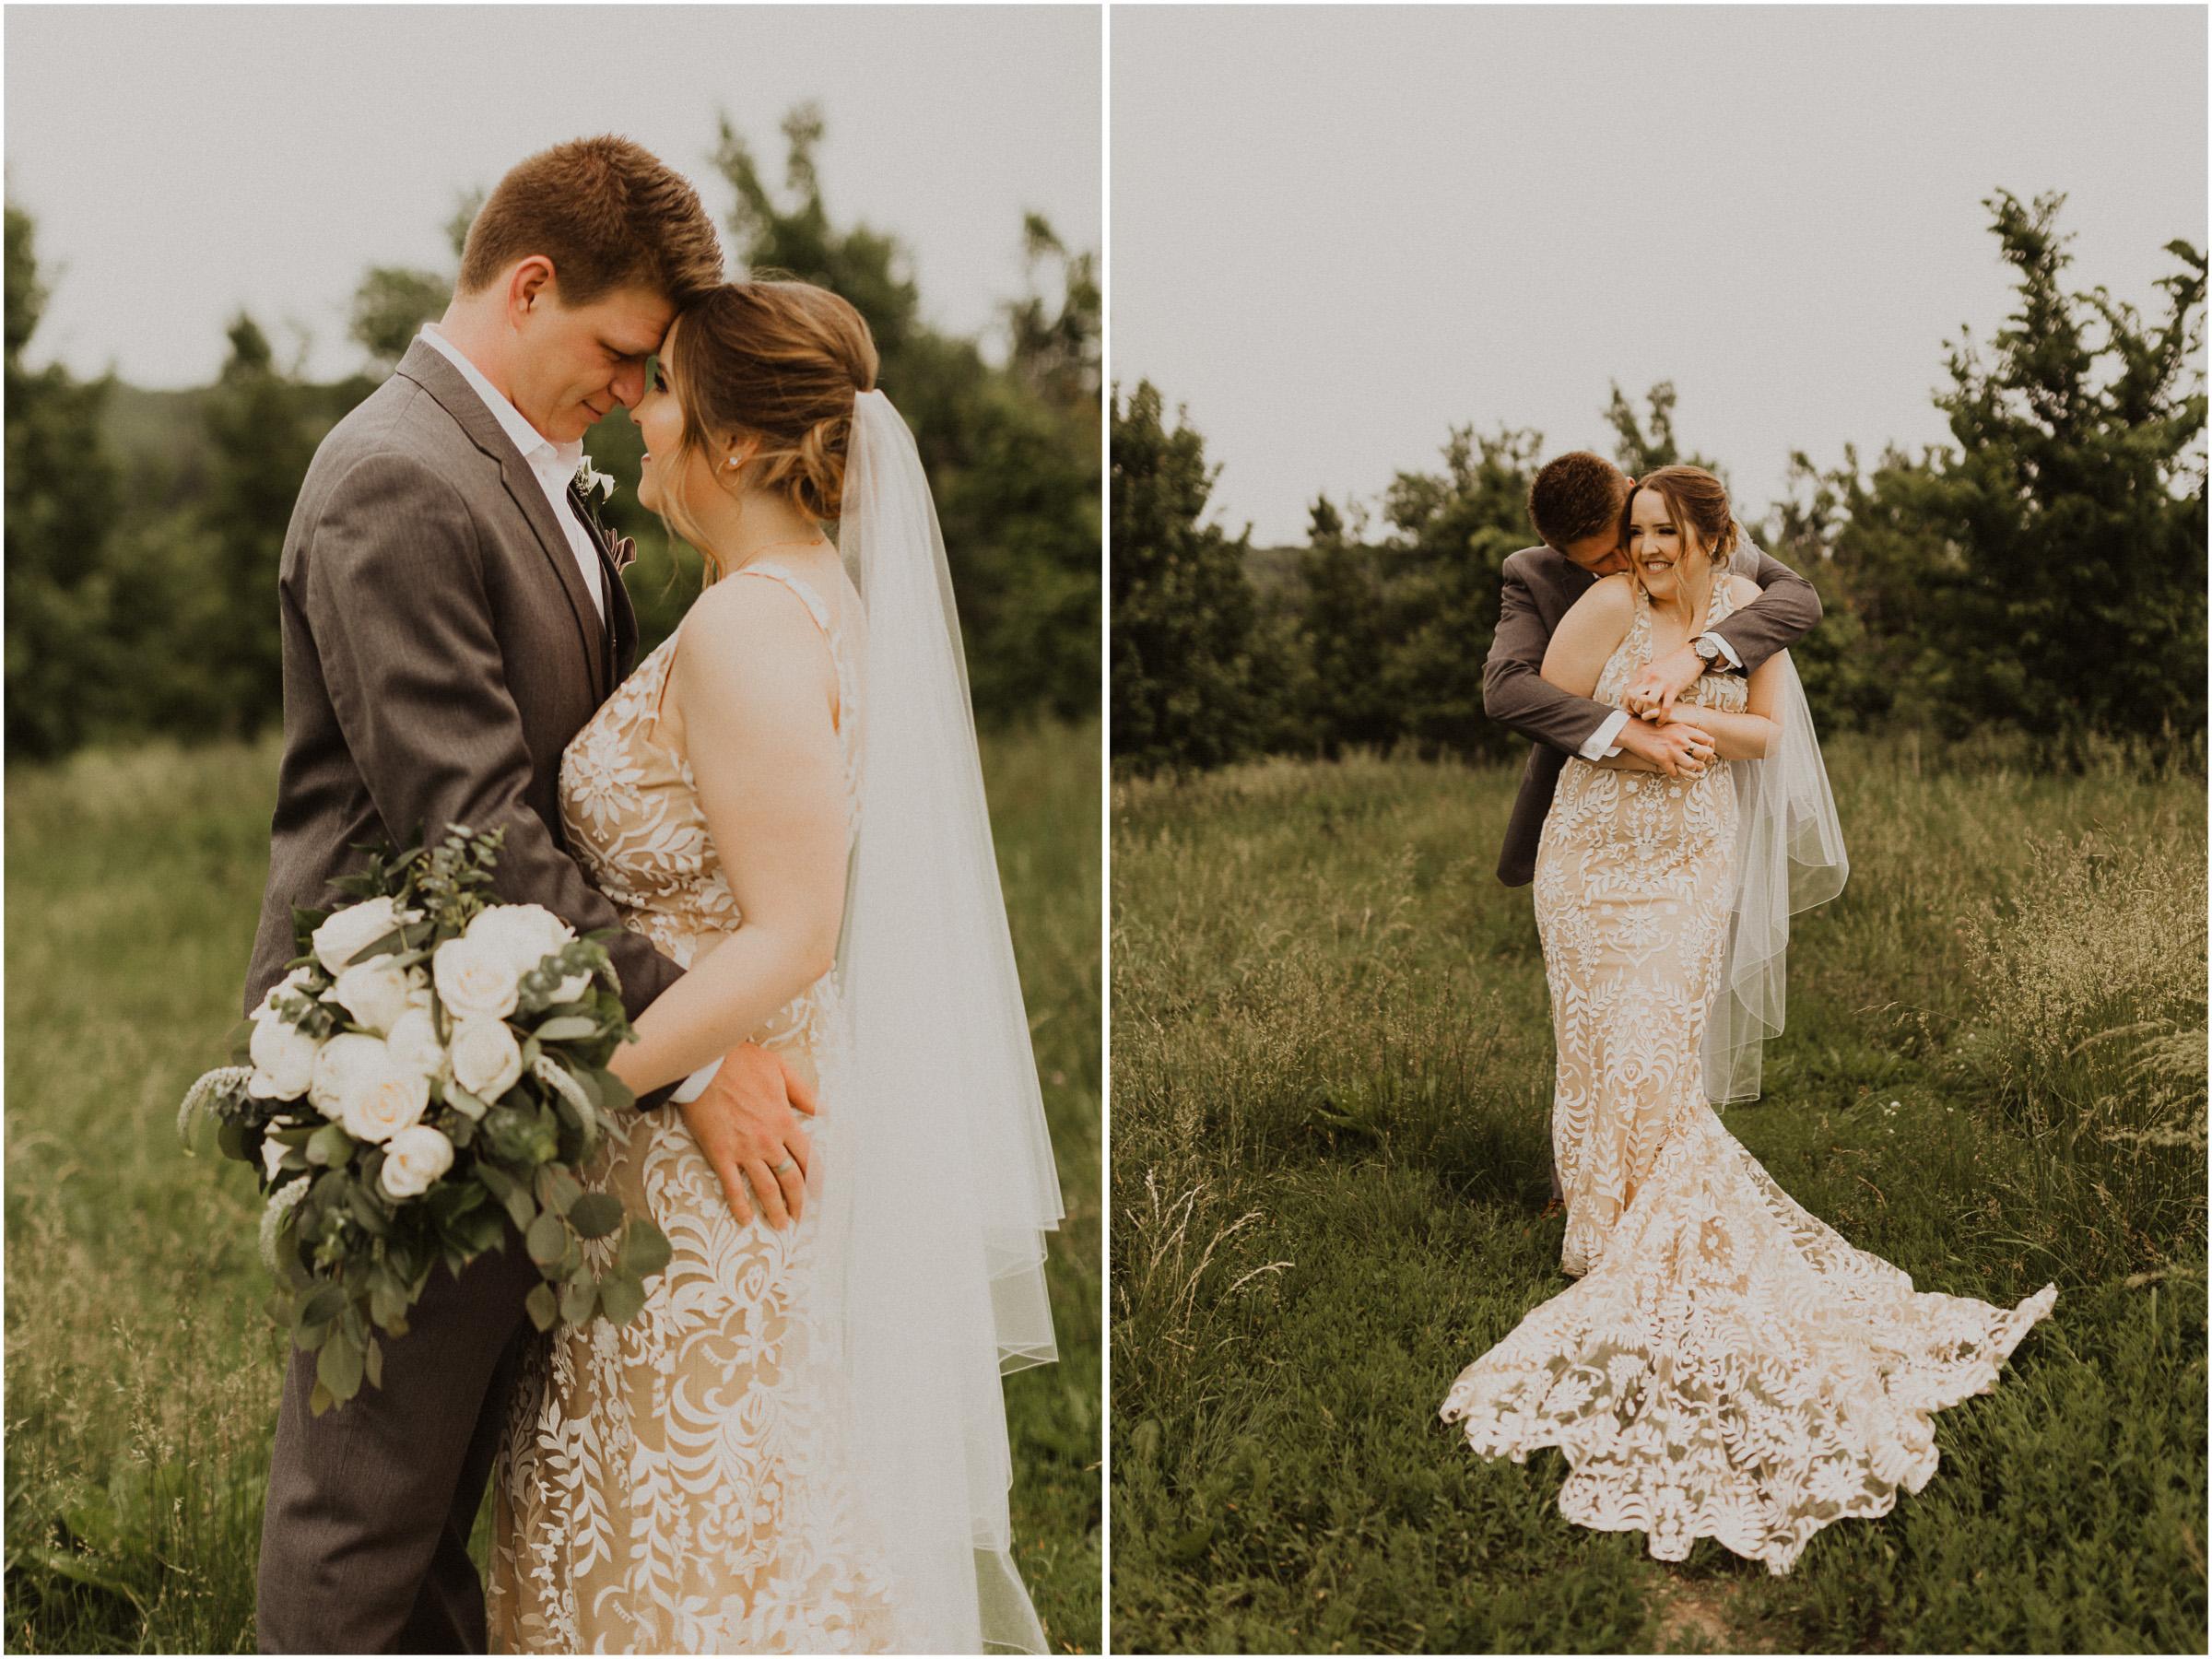 alyssa barletter photography weston red barn farm timberbarn summer outdoor wedding-17.jpg